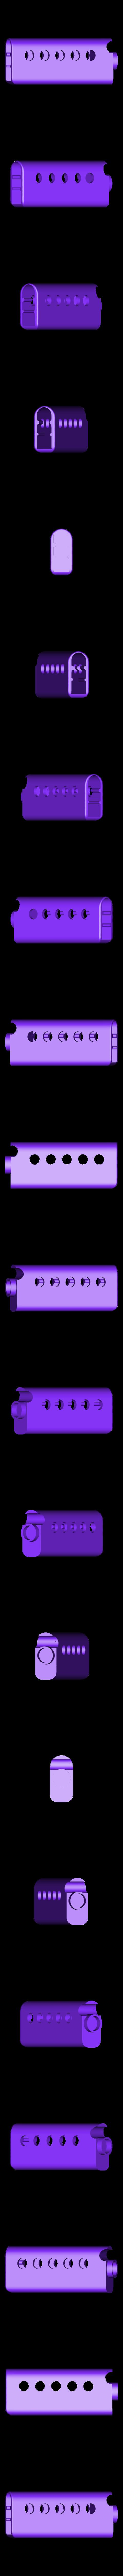 forlenger.stl Download STL file GUN SHOOTS RUBBERBAND  • 3D printing object, JonathanOlivarDizon